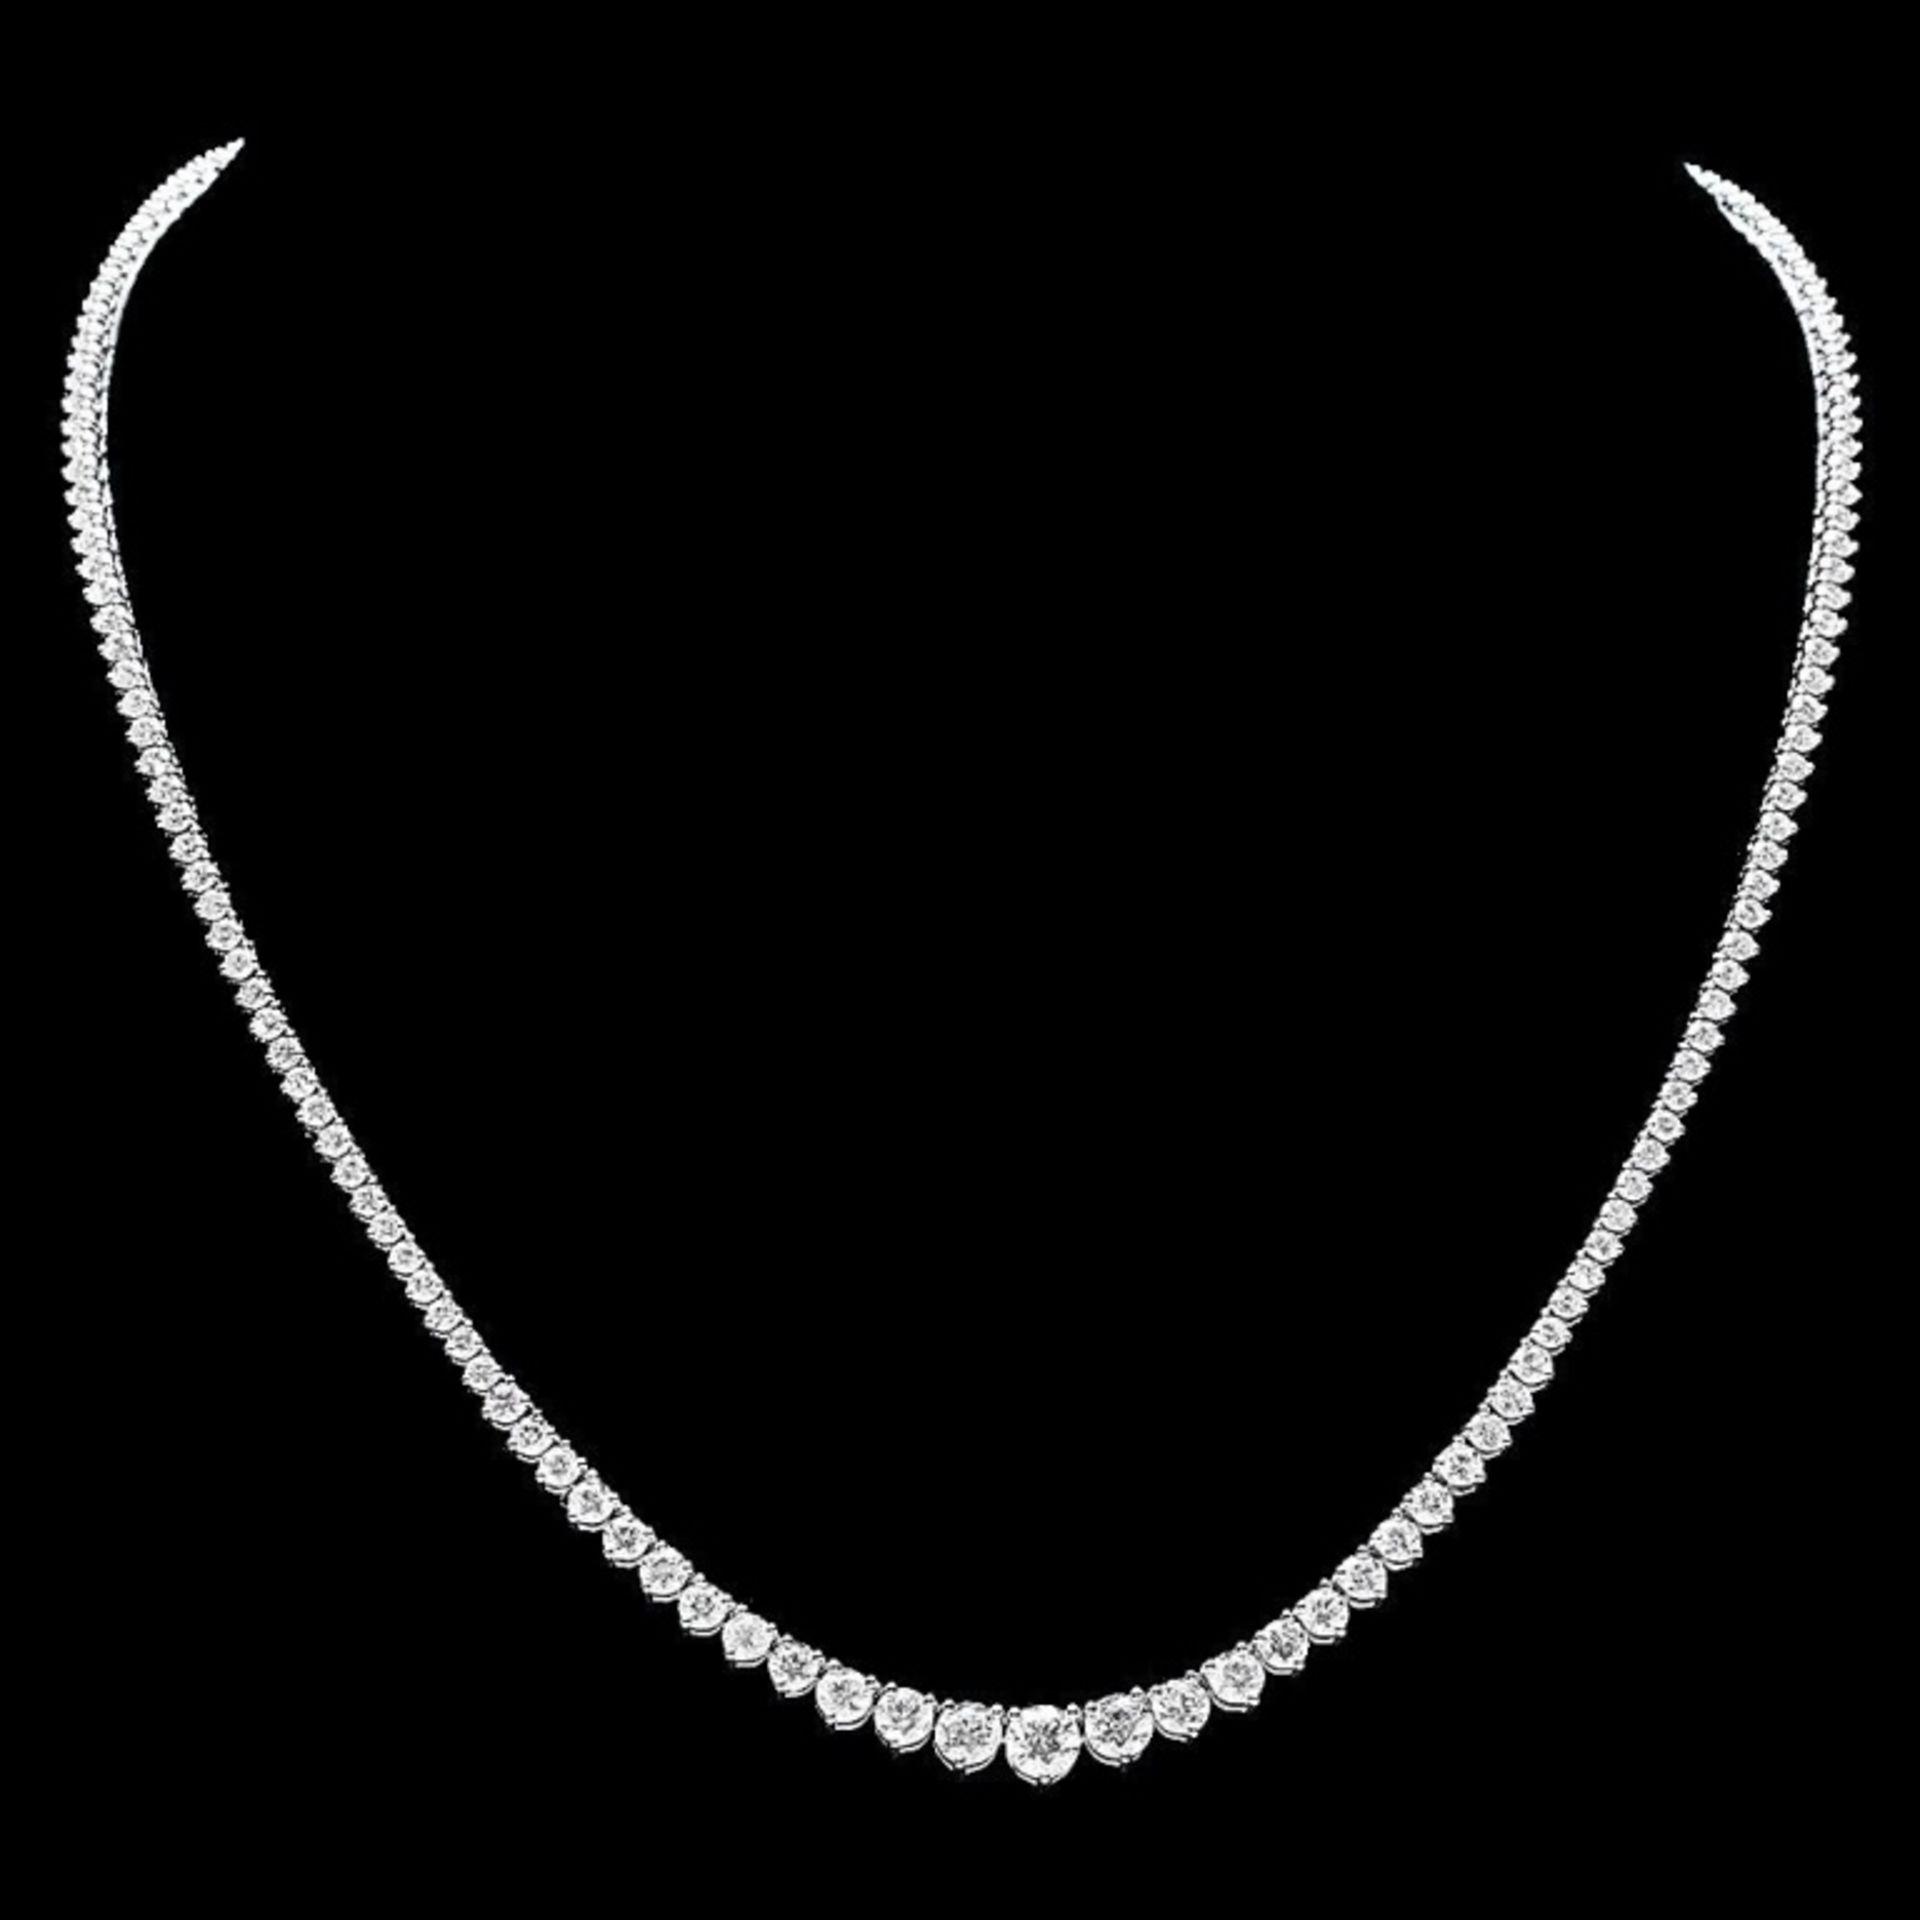 18k White Gold 12.00ct Diamond Necklace